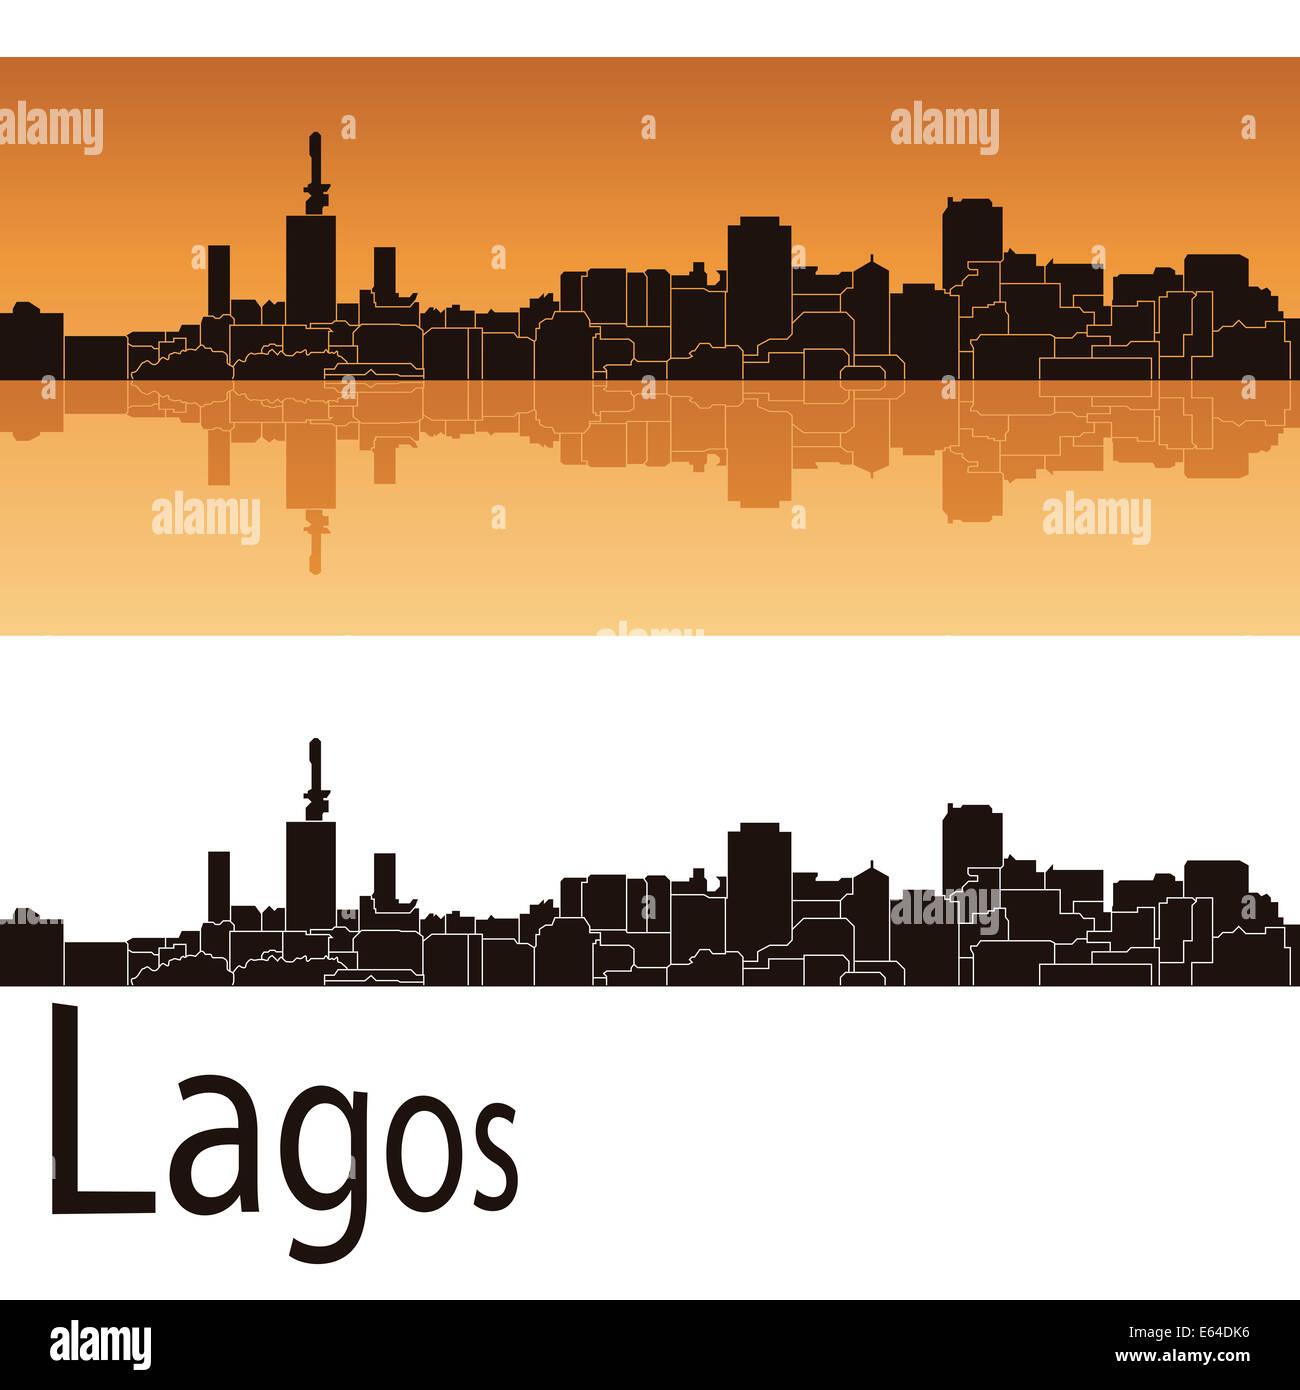 Lagos Nigeria Buildings Stock Photos & Lagos Nigeria